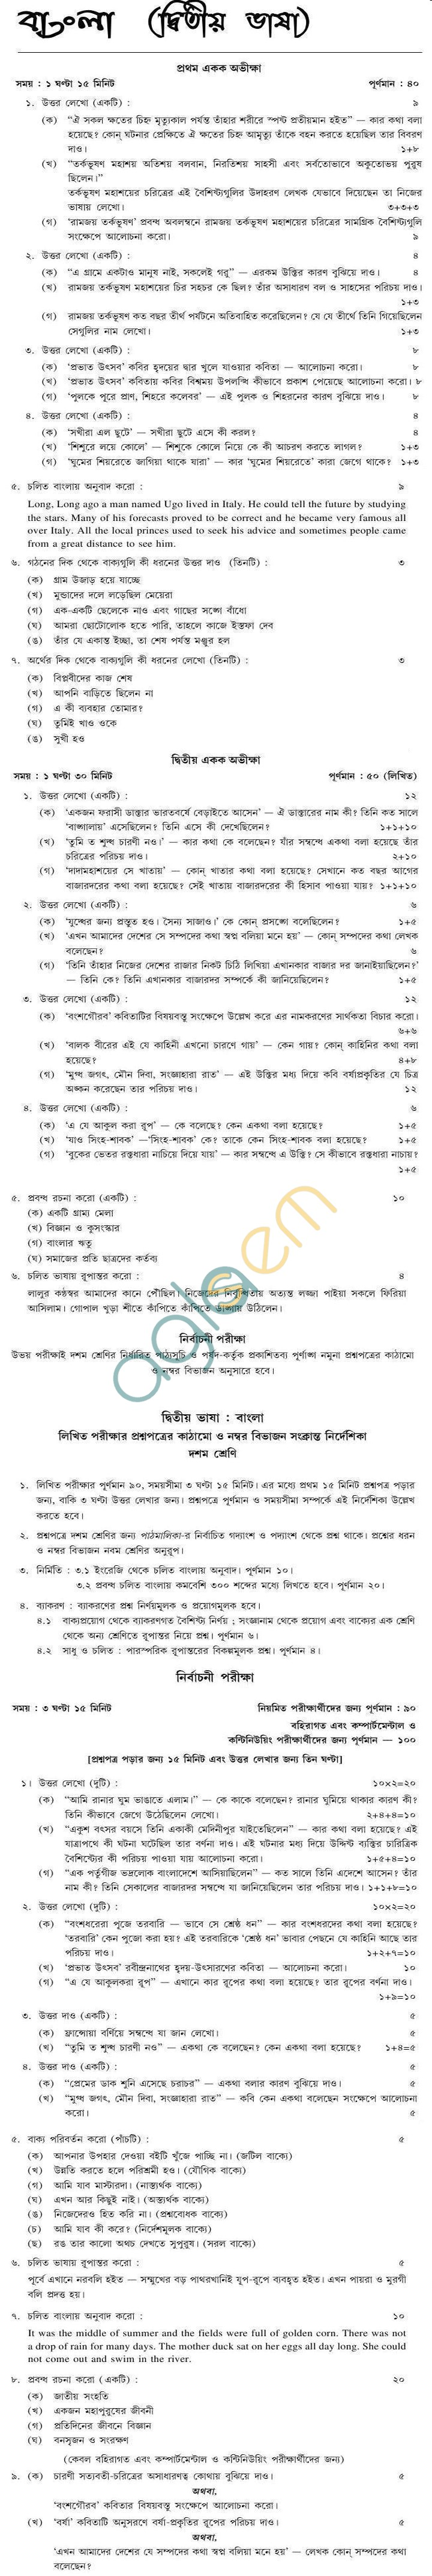 WB Board Sample Question Papers for Madhyamik Pariksha (Class 10) -Bengali